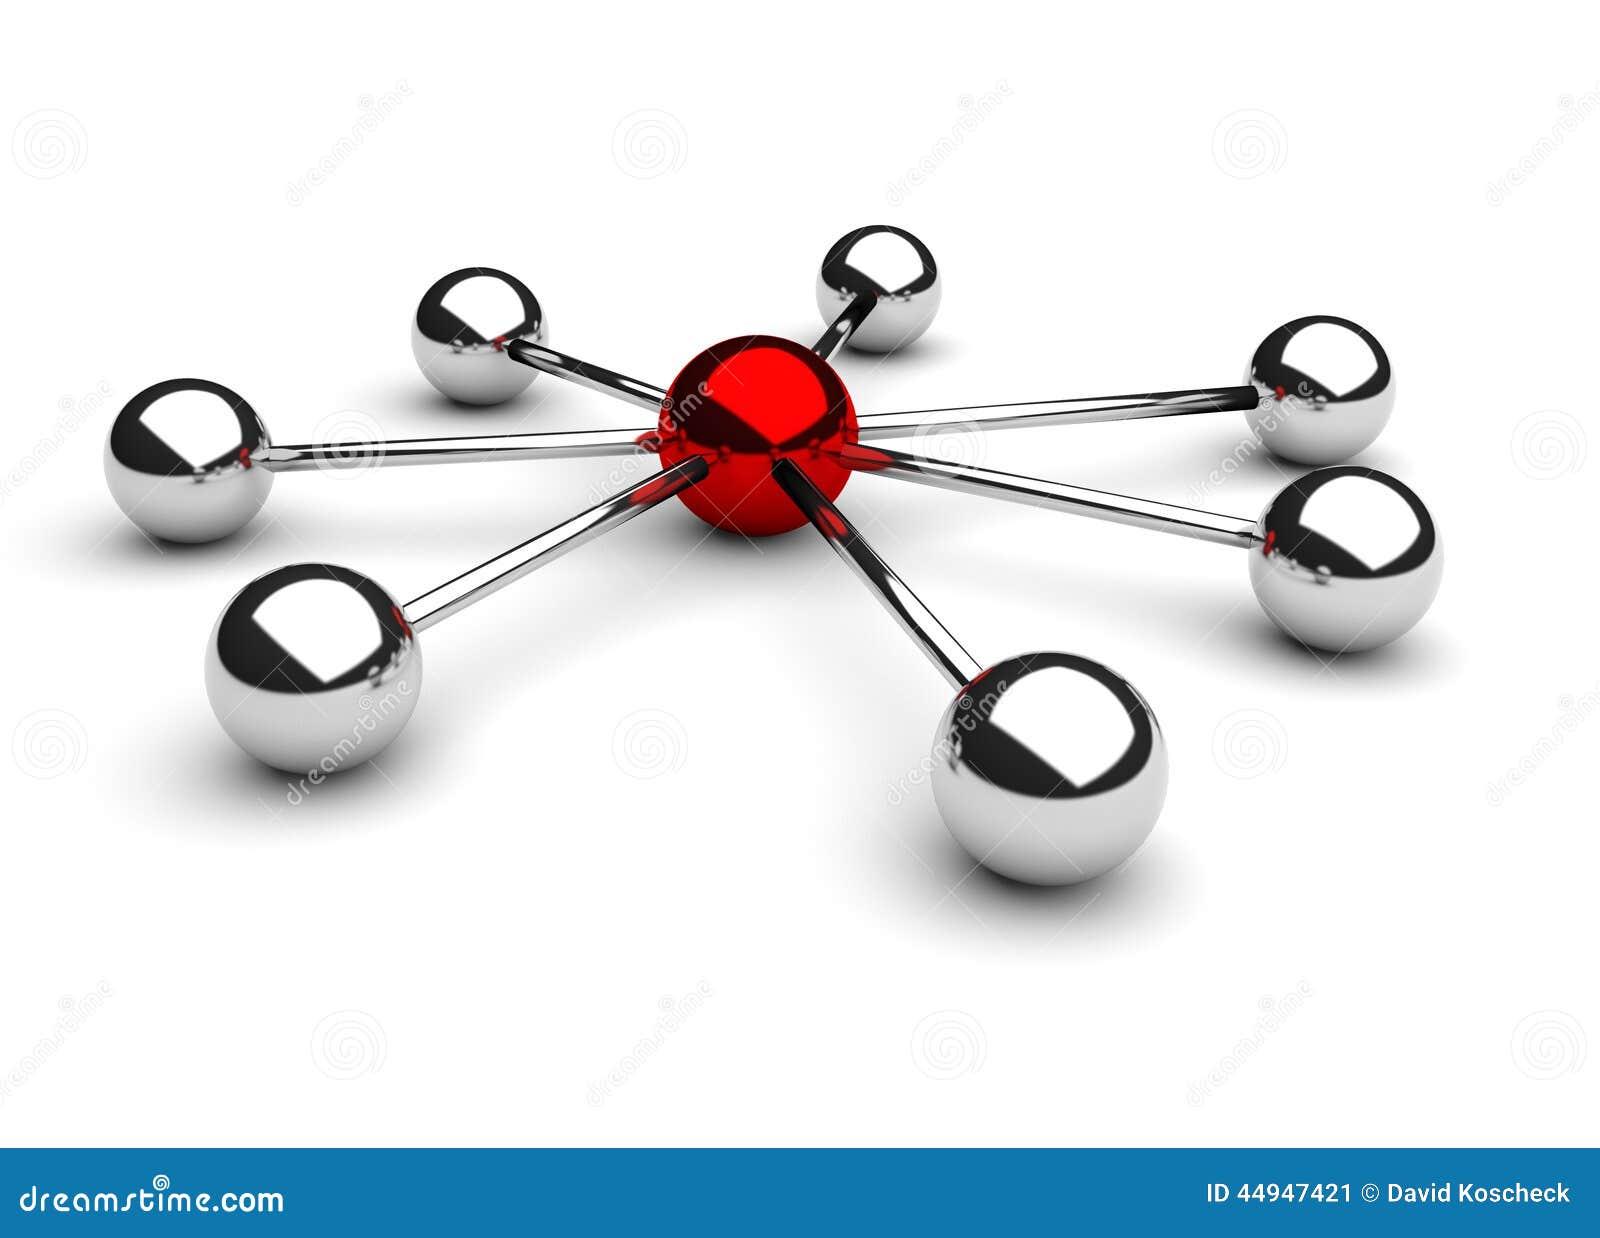 networt stock illustration illustration of glossy internet 44947421